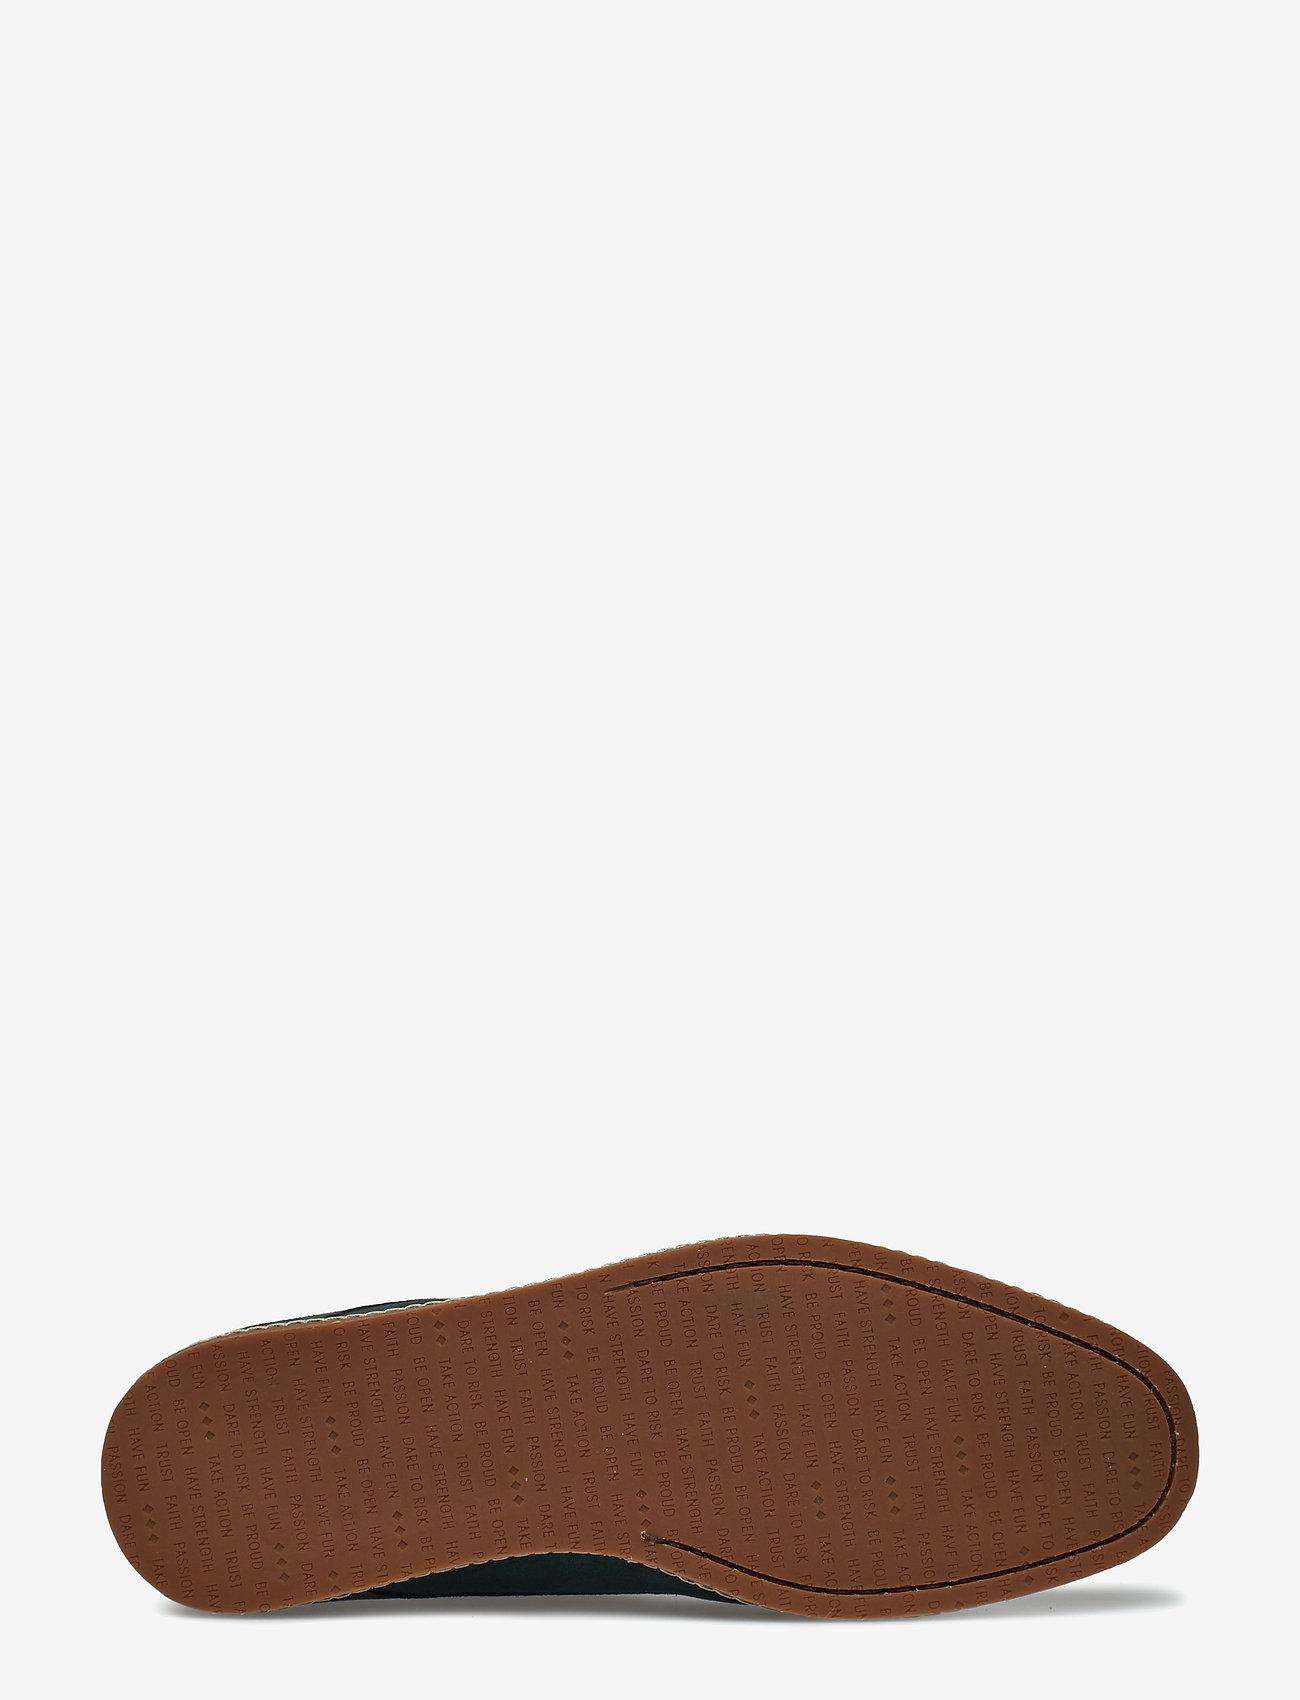 Royal RepubliQ Evo Derby Shoe Suede - Business GREEN - Schuhe Billige